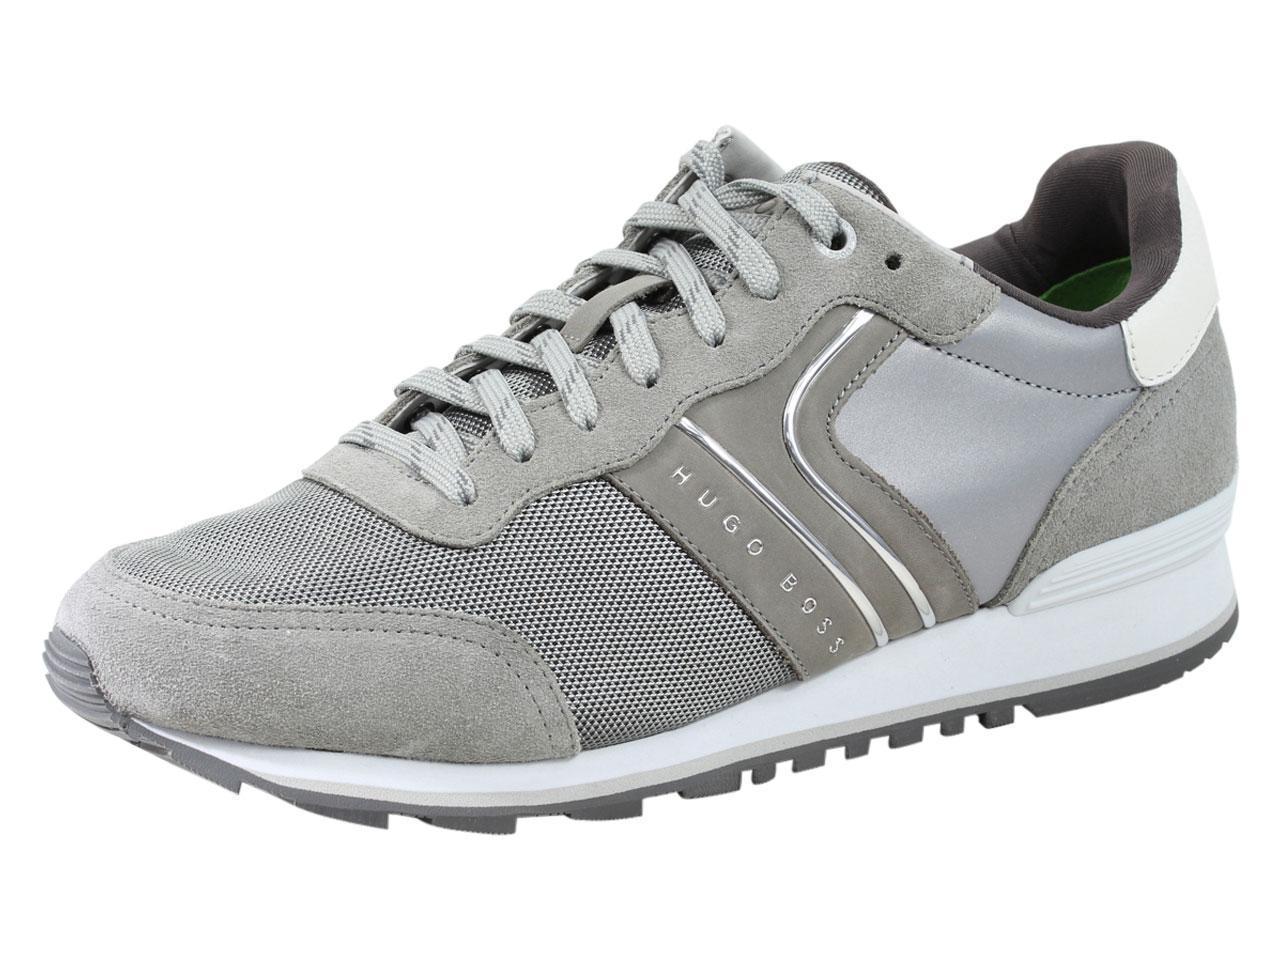 adcb5f0b340 Hugo Boss Men s Parkour Memory Foam Trainers Sneakers Shoes